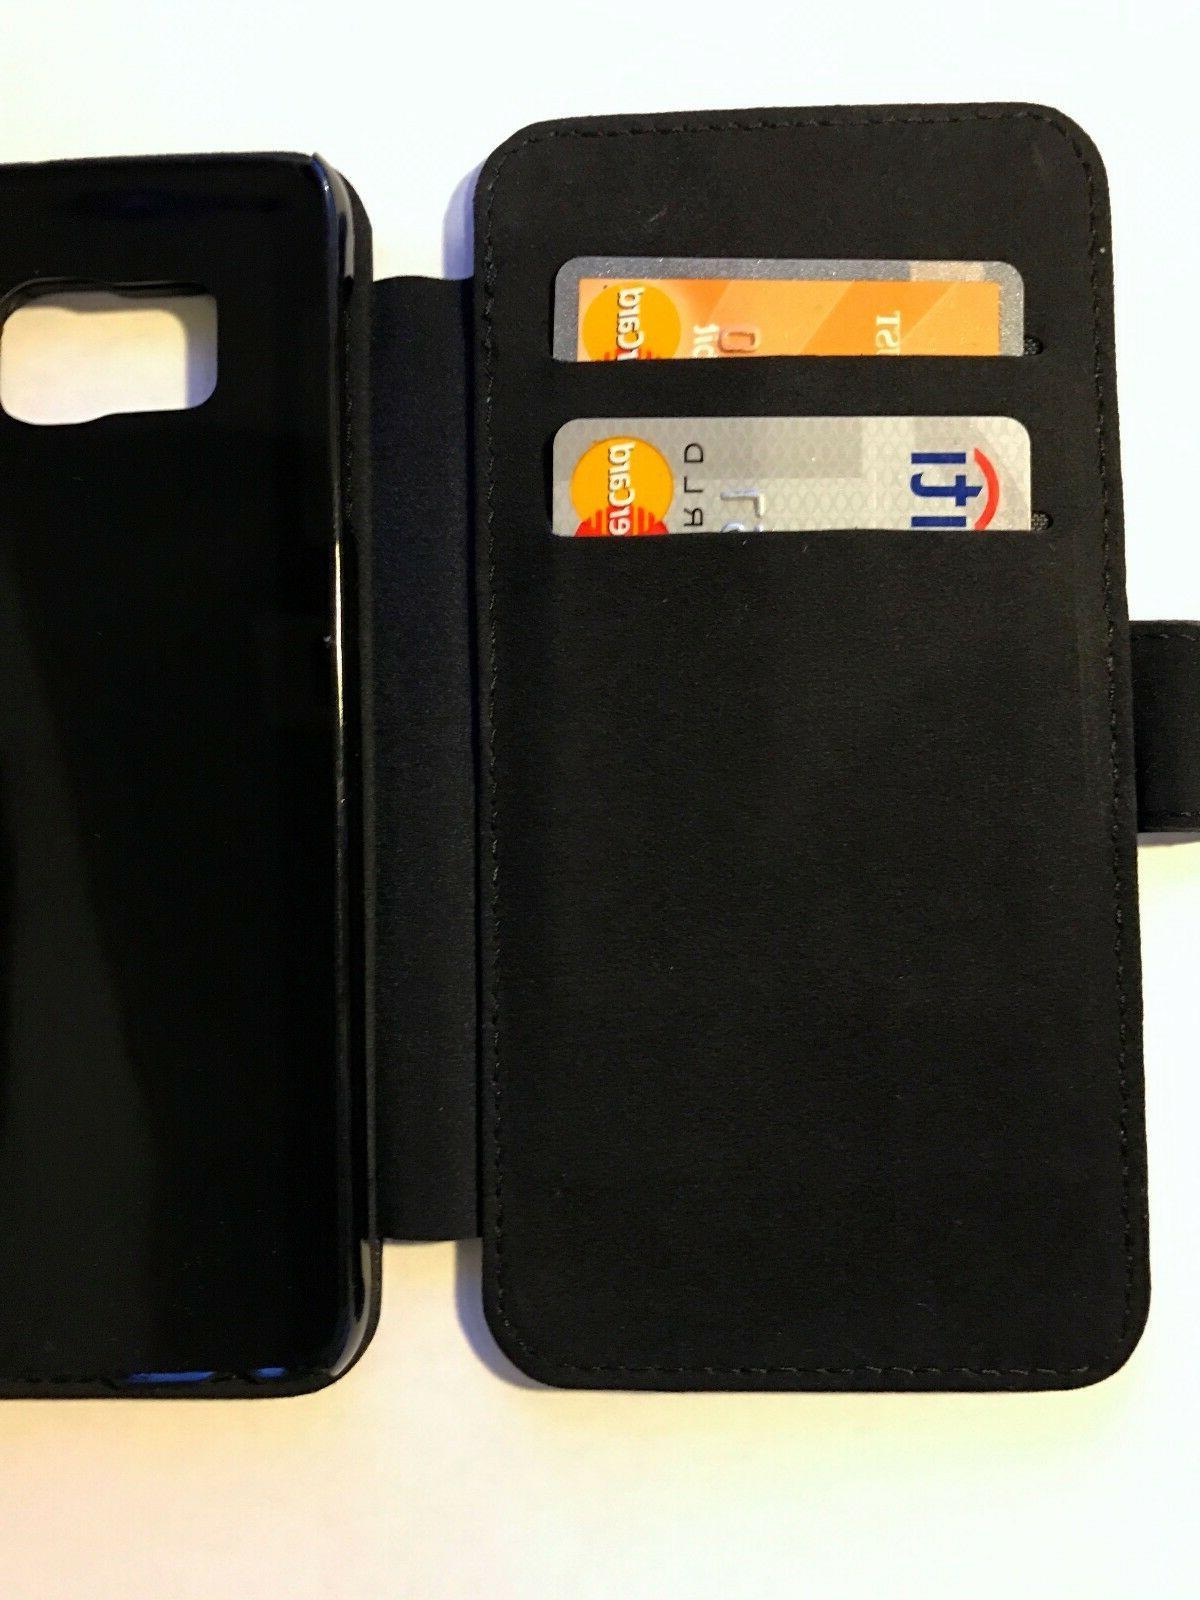 Nagasaki Phone Case Cover iPhone Samsung